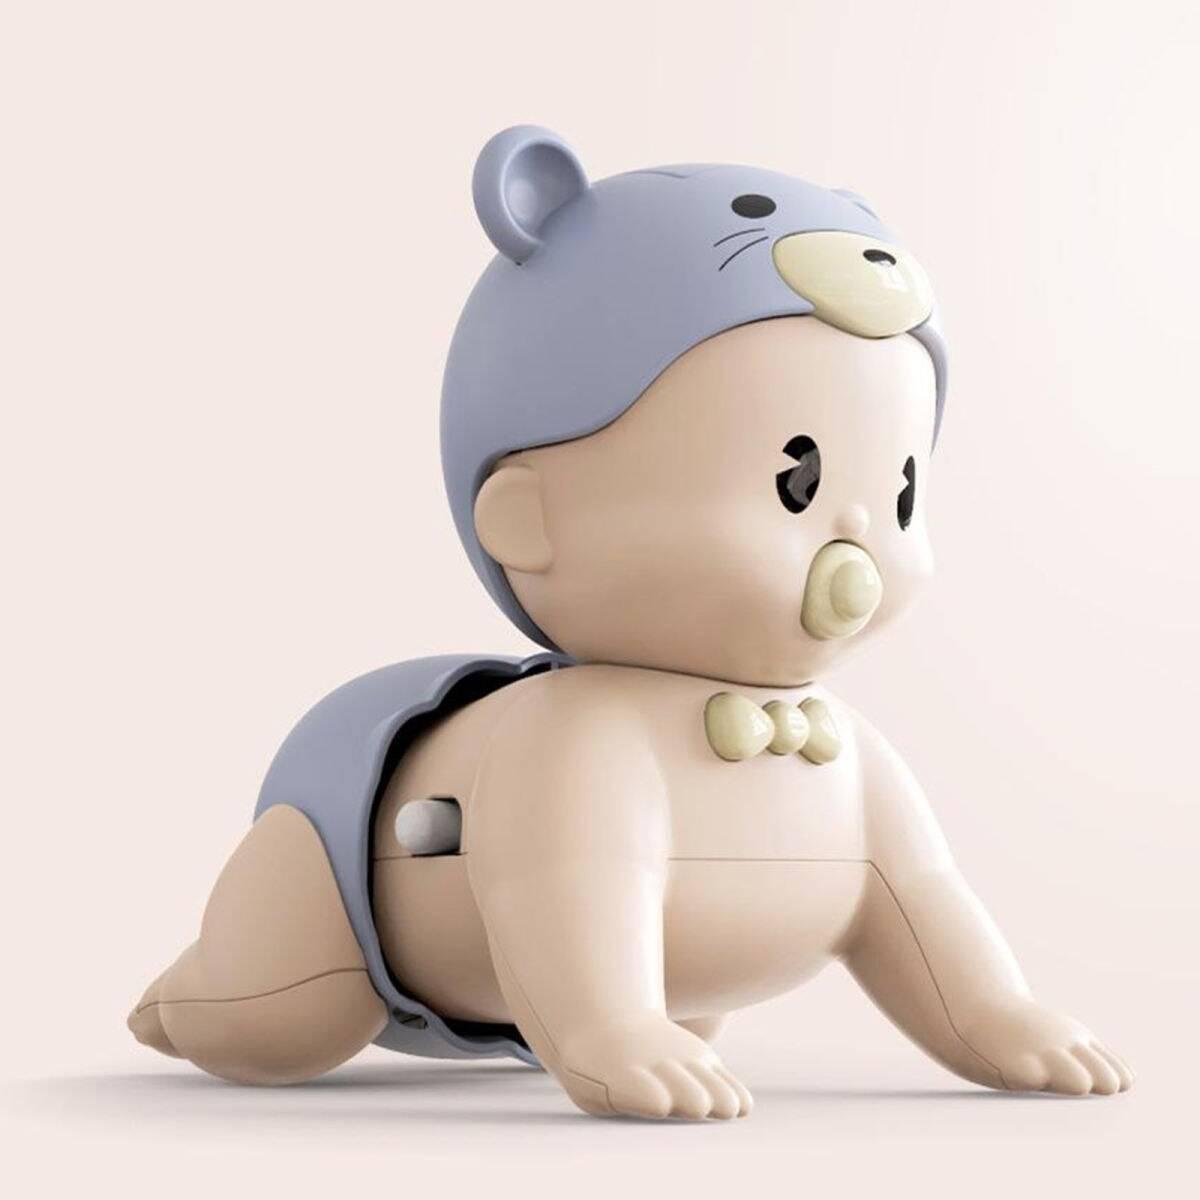 Cute Crawling Baby Toy